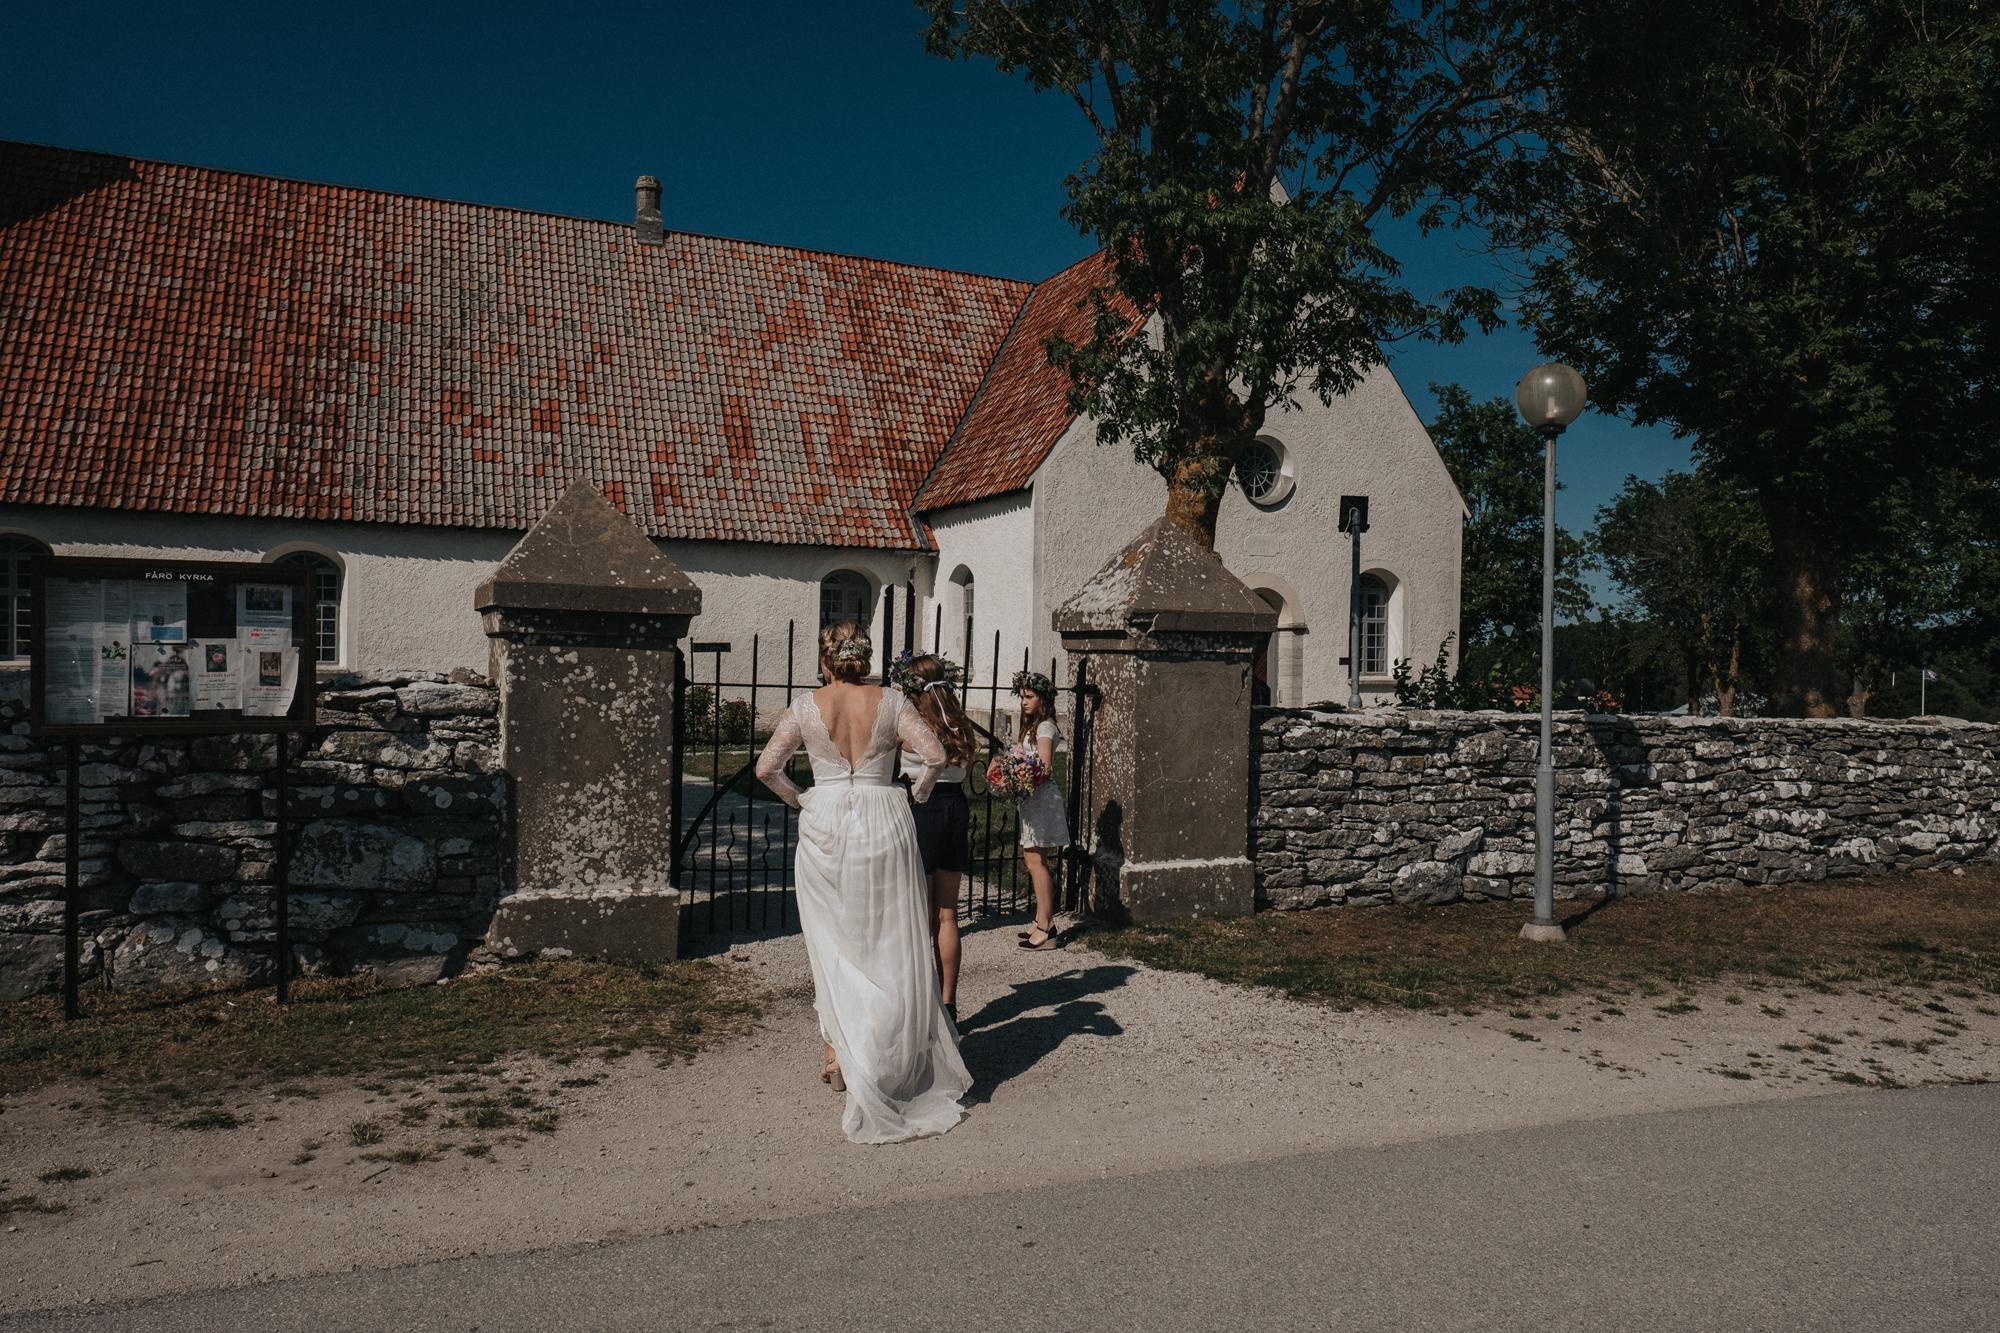 014-bröllop-fårö-neas-fotografi.jpg